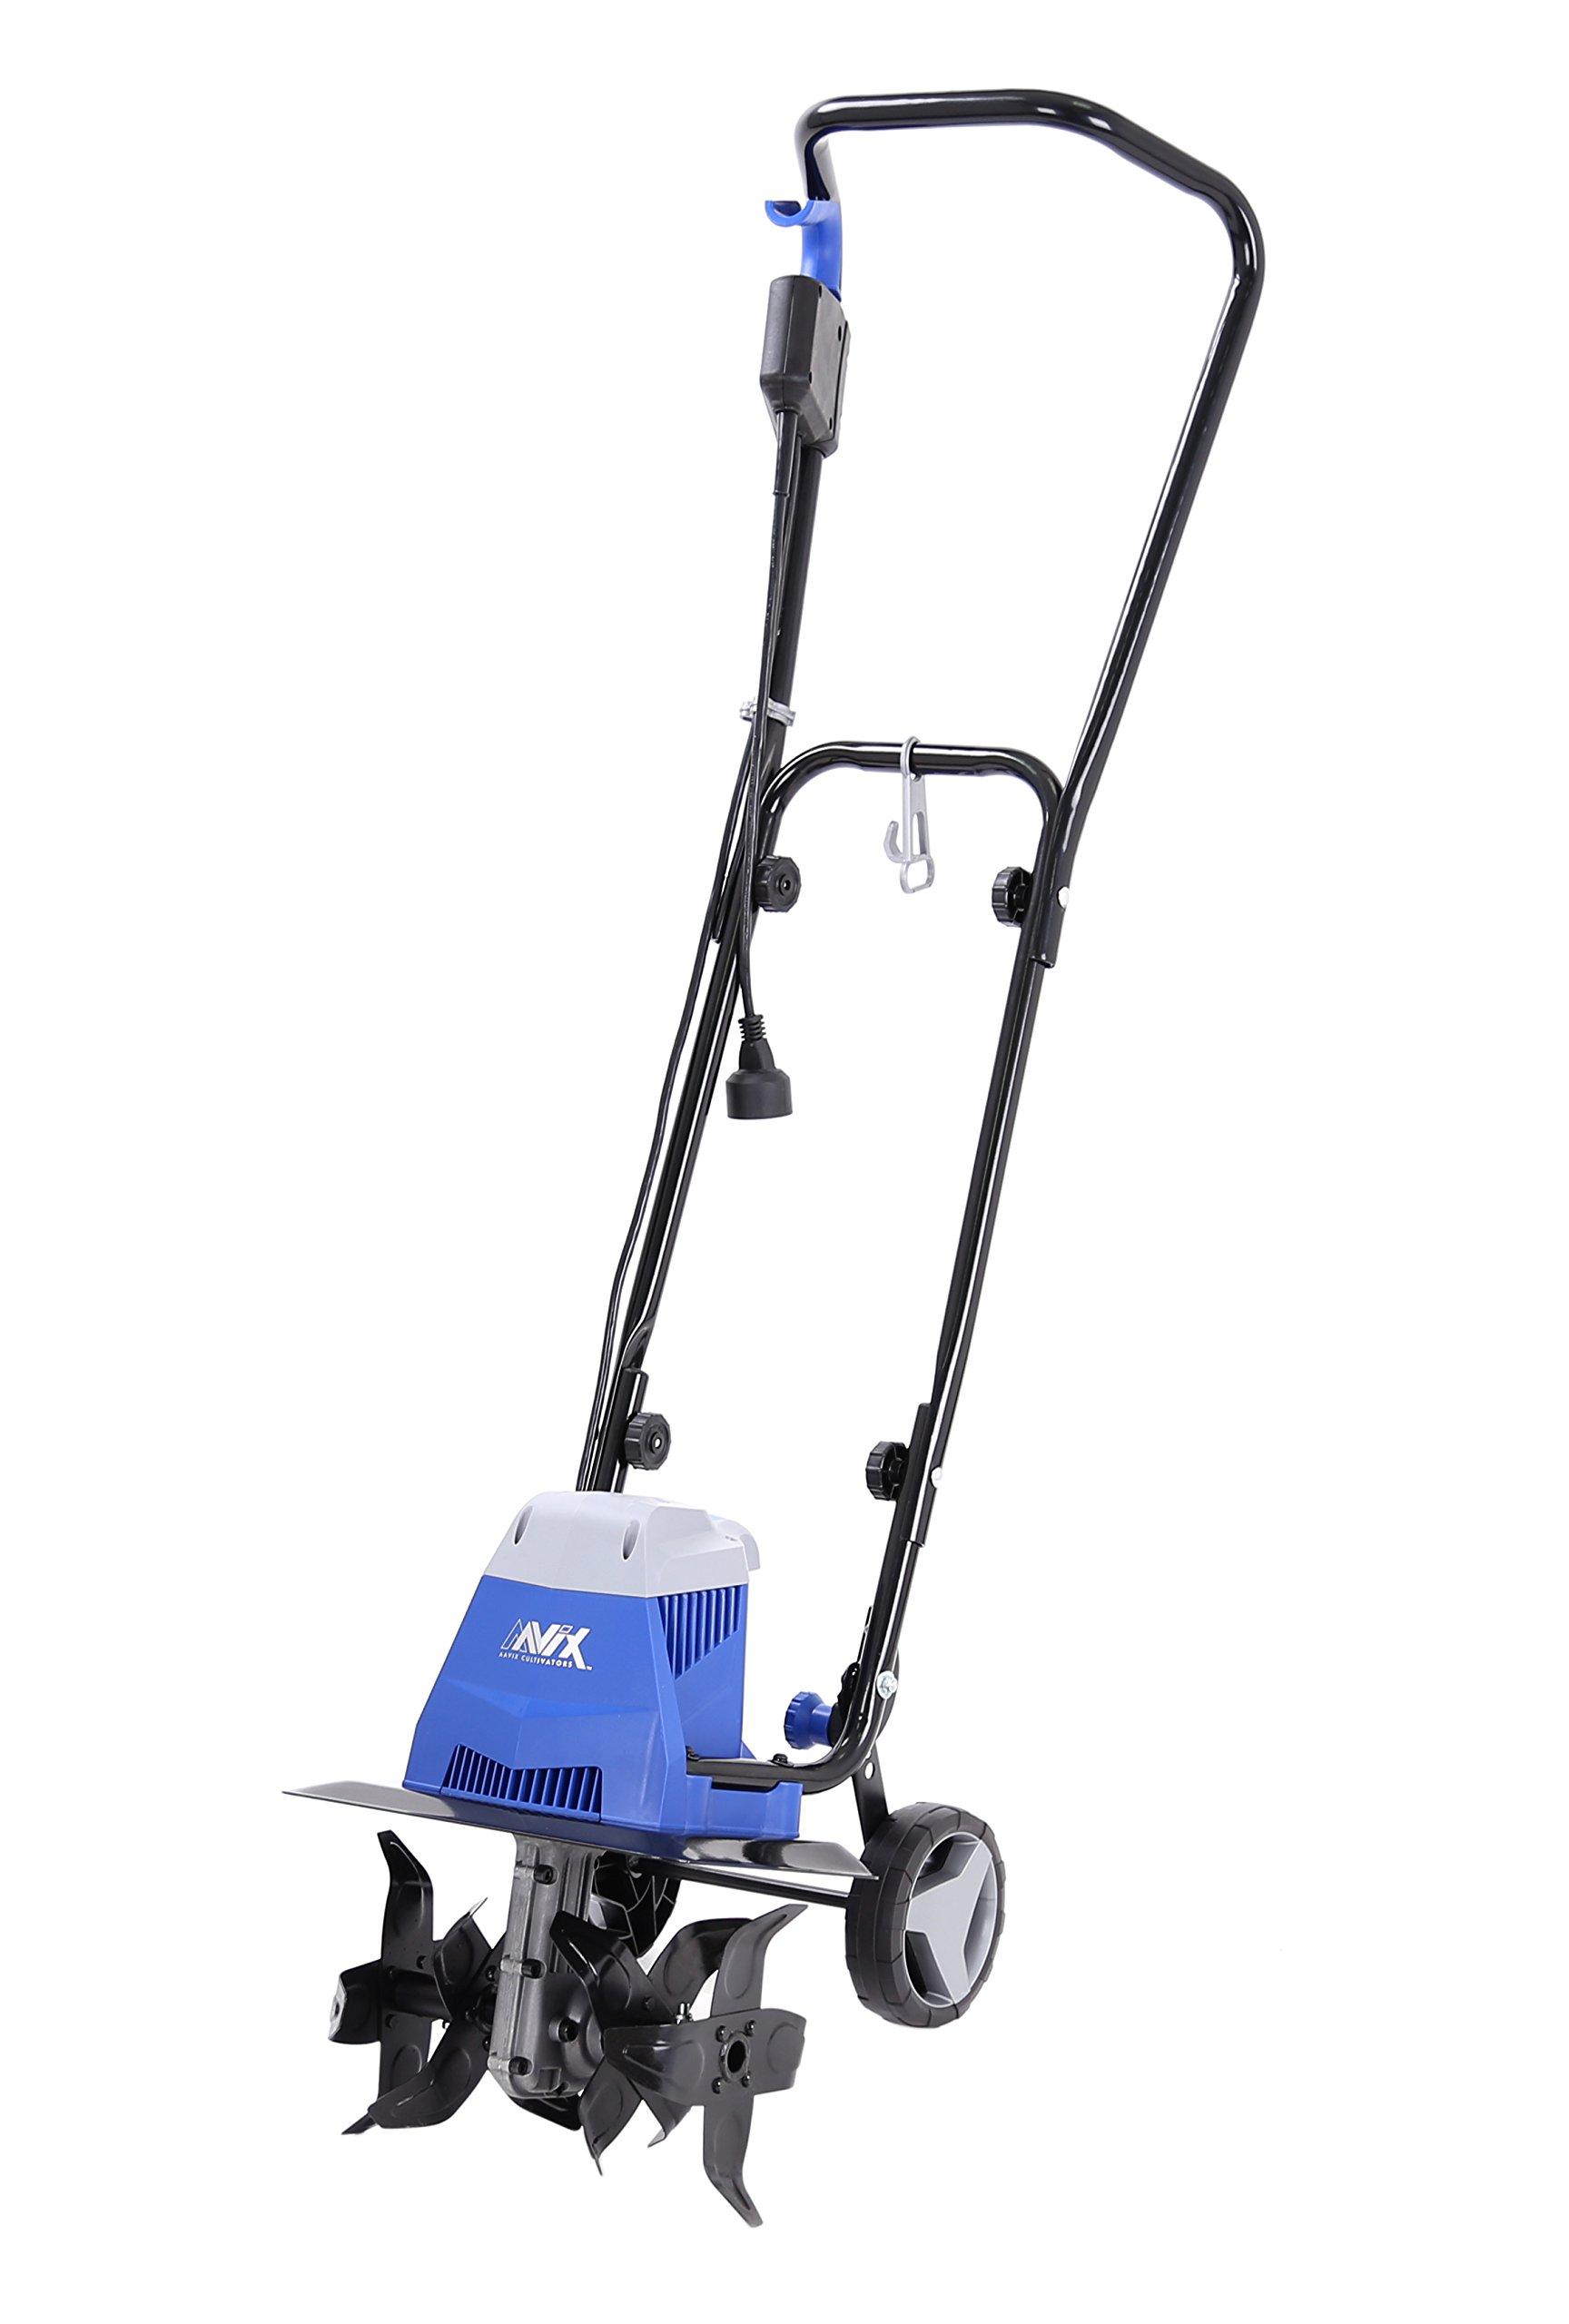 AAVIX AGT307 10 Amp Electric Tiller/Cultivator, 13'', Black/Blue by AAVIX